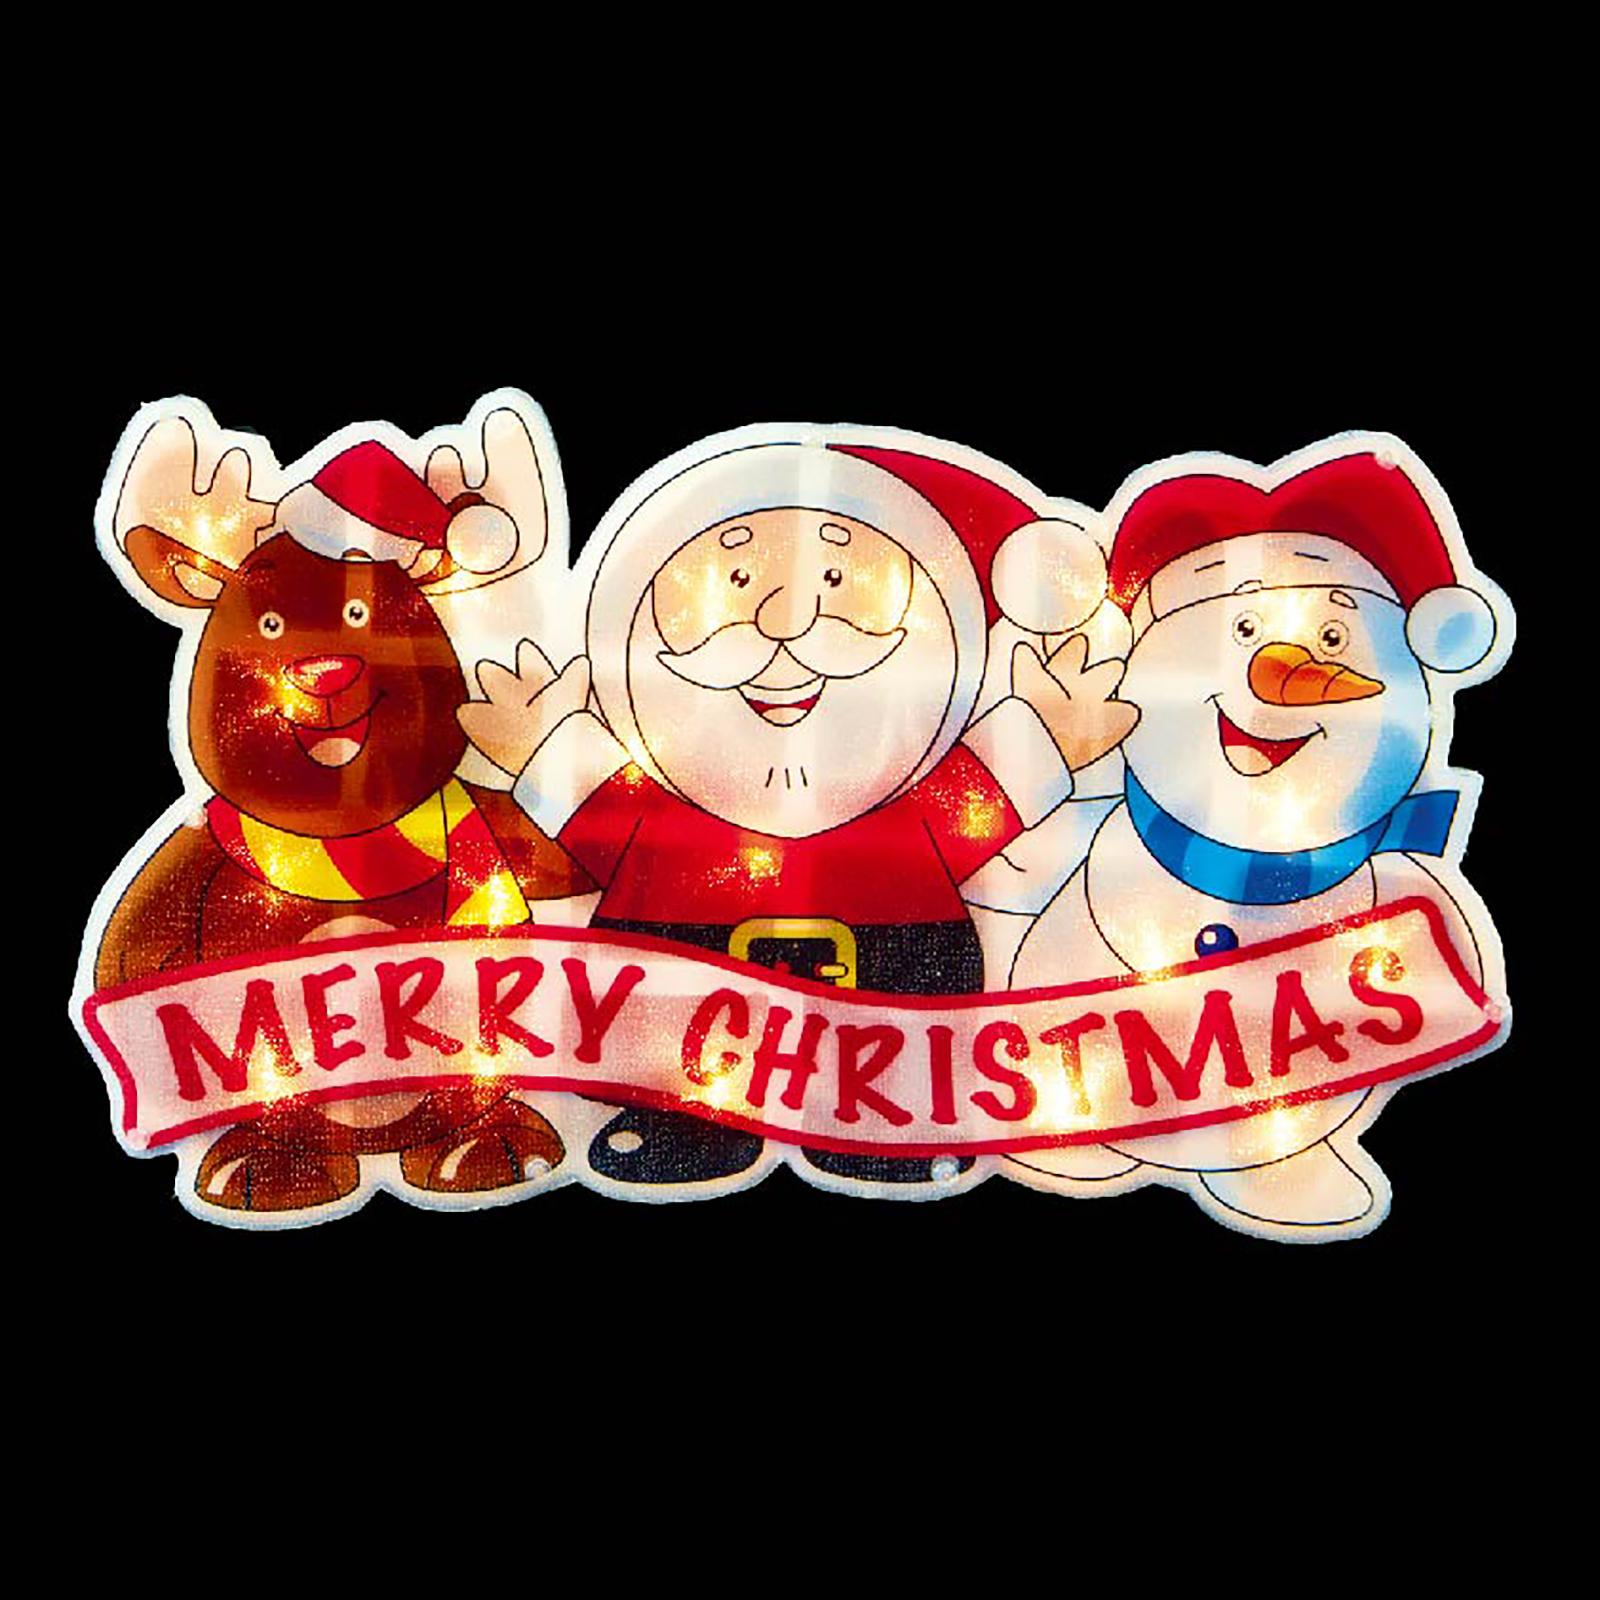 Light Up Parcels Christmas Decorations Argos: Battery Operated Light Up Rudolf Santa Snowman Christmas